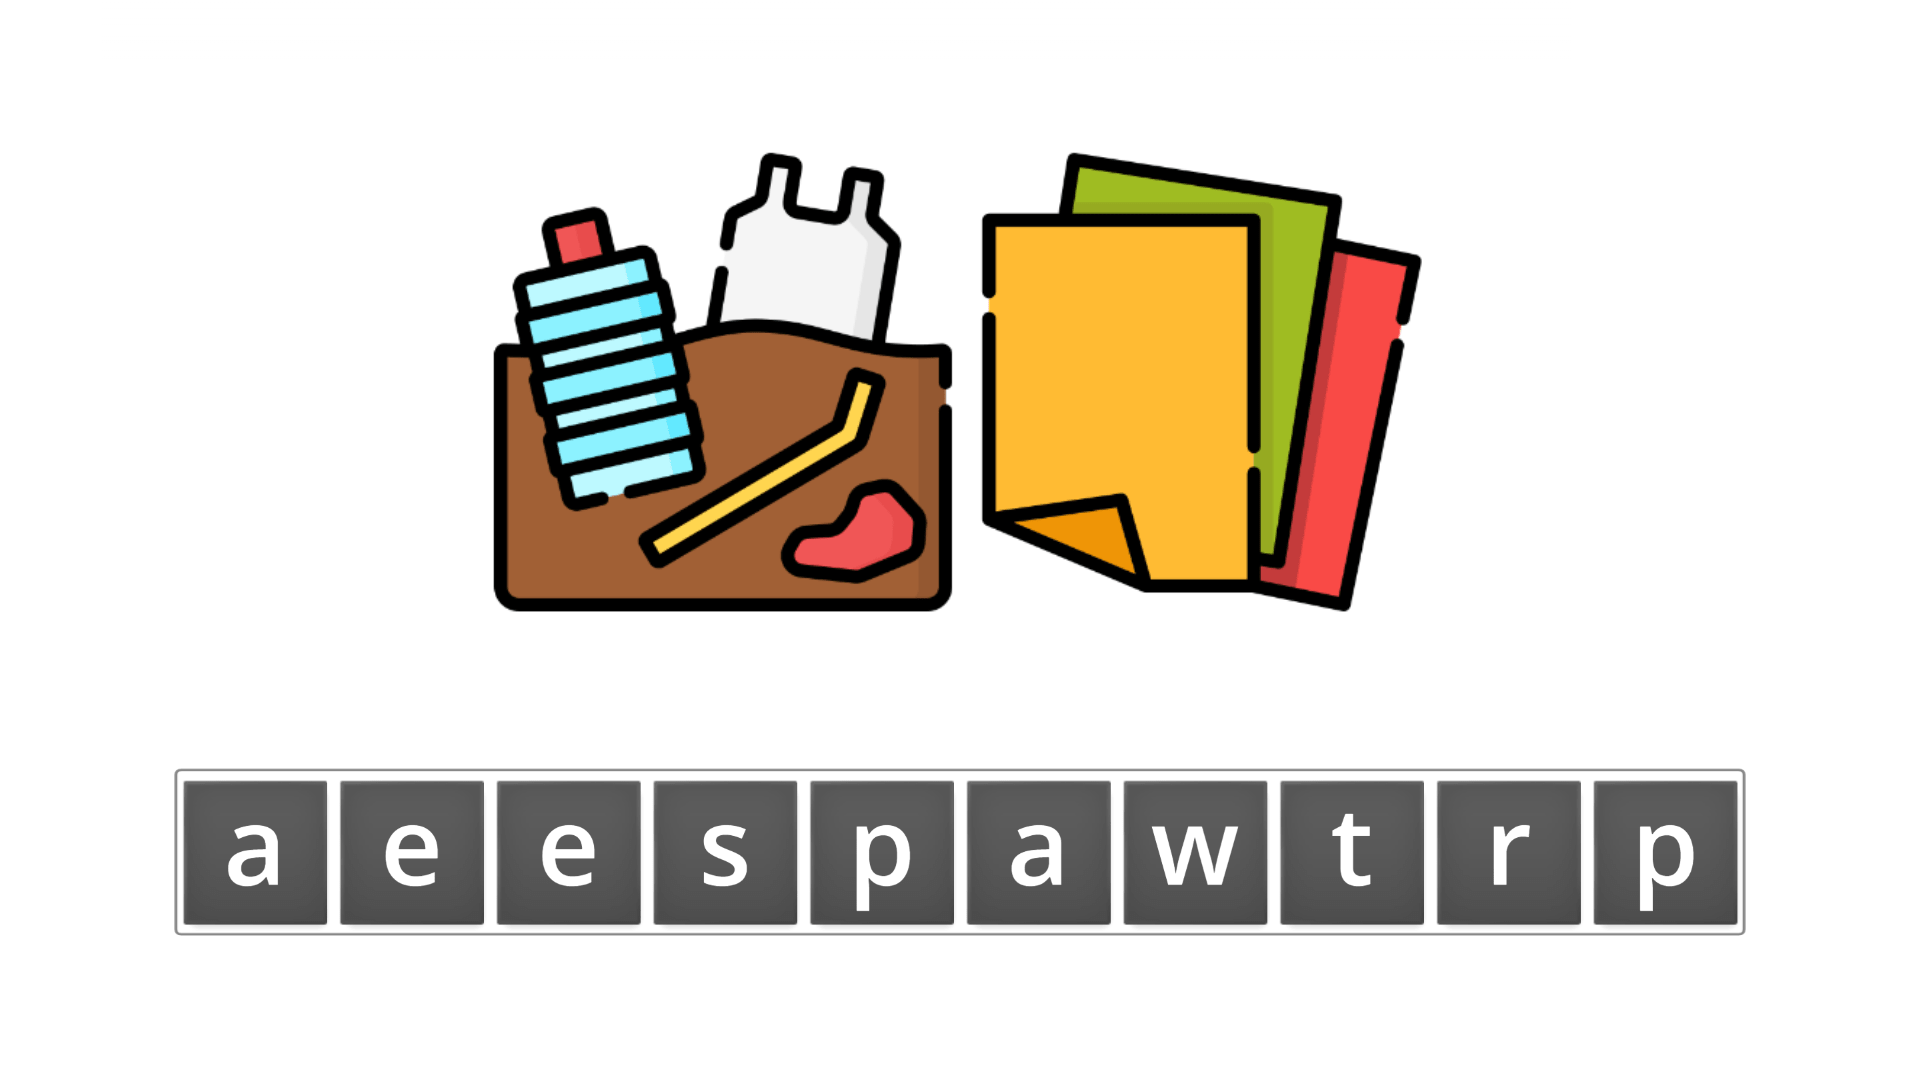 esl resources - flashcards - compound nouns  - unscramble - wastepaper